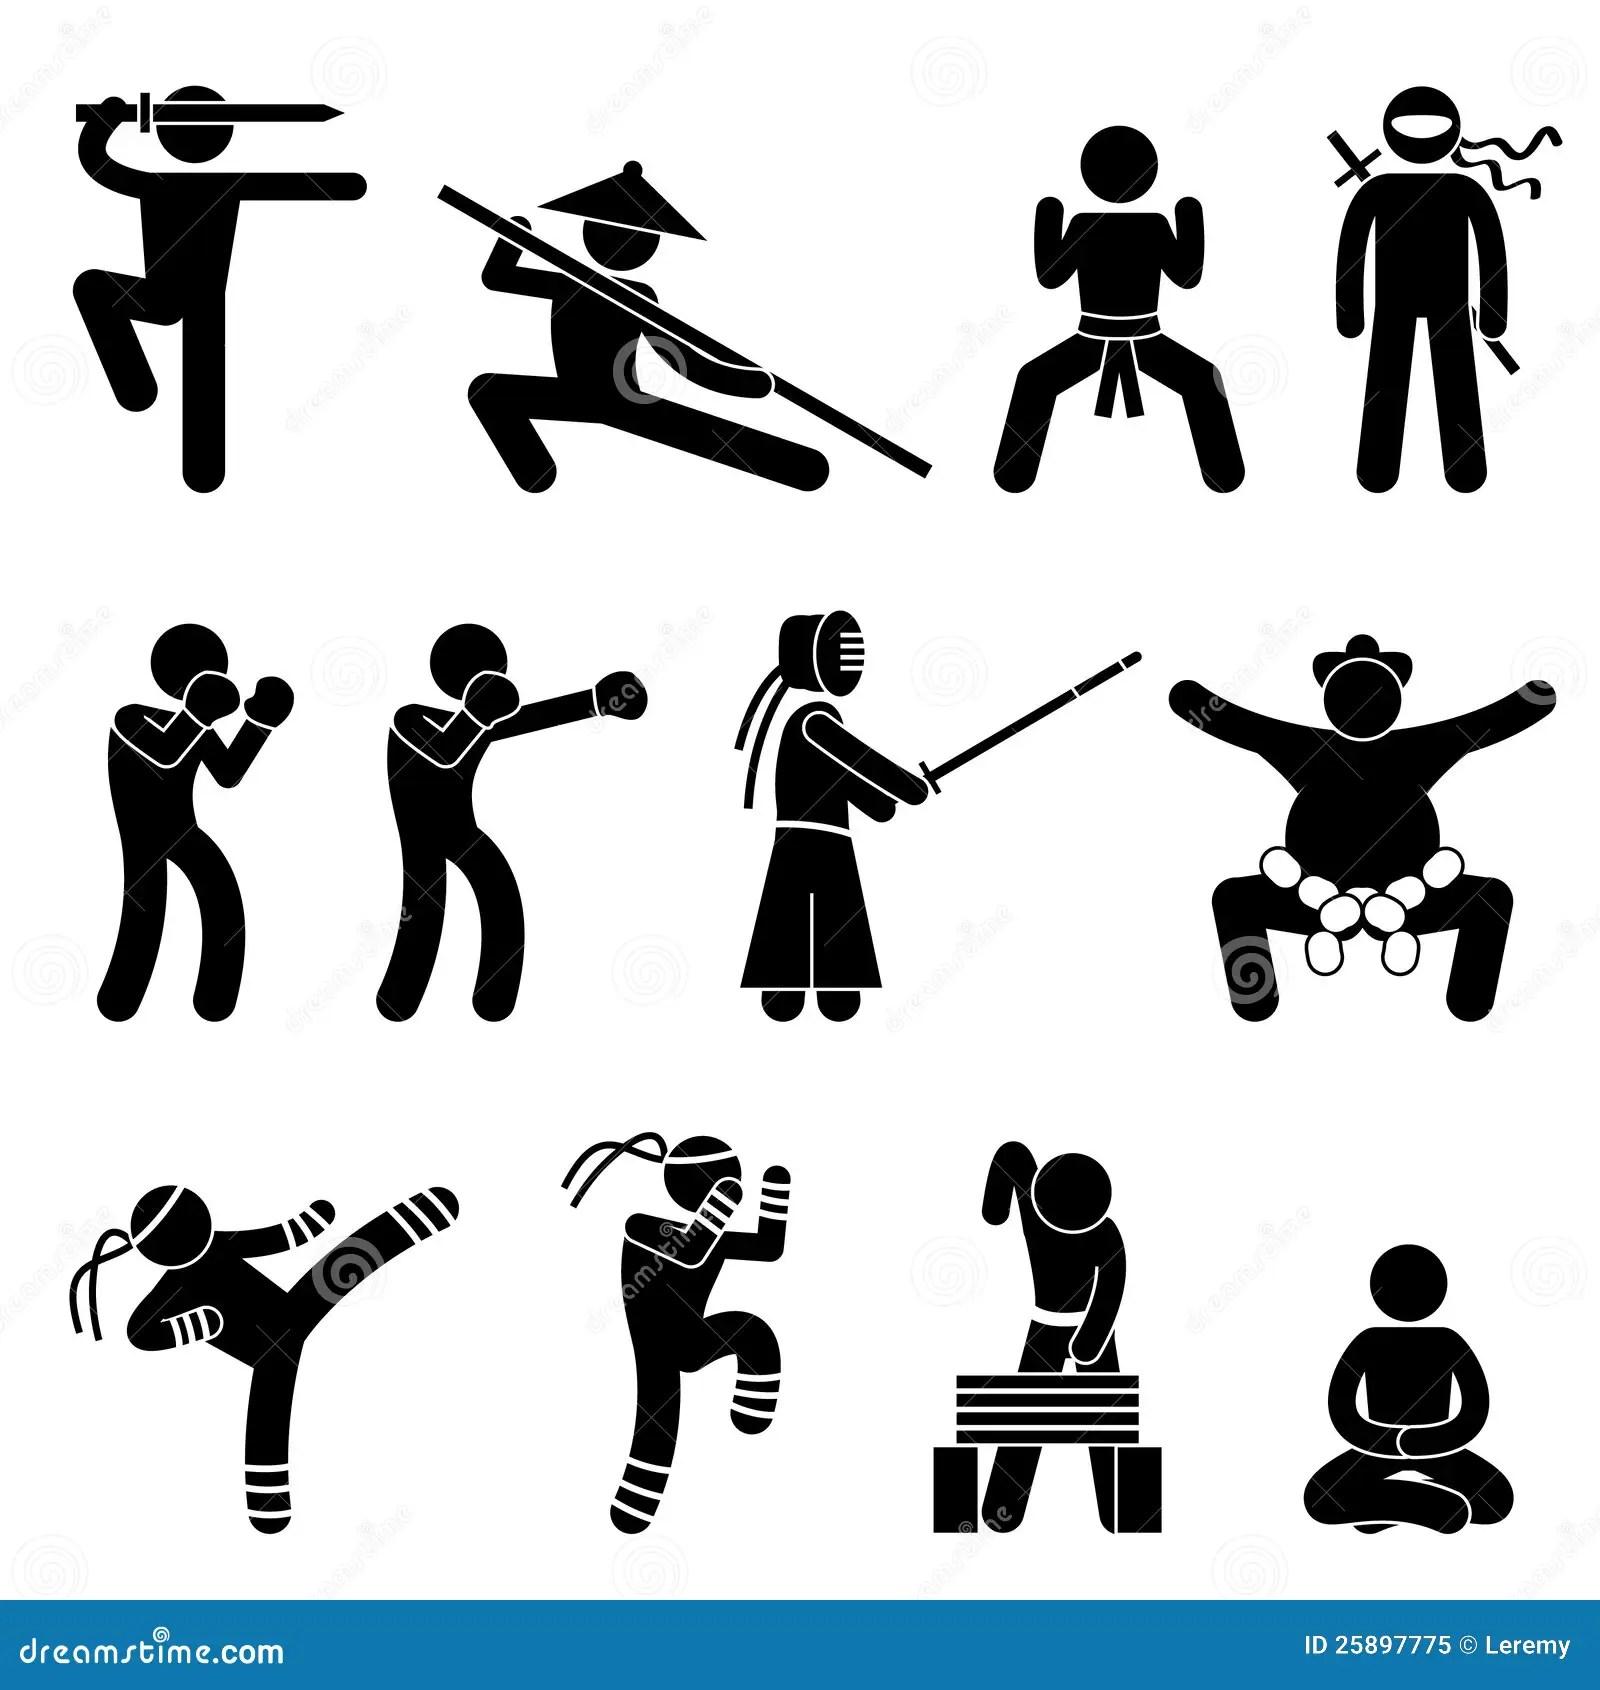 Kung Fu Martial Arts Self Defense Pictogram Royalty Free